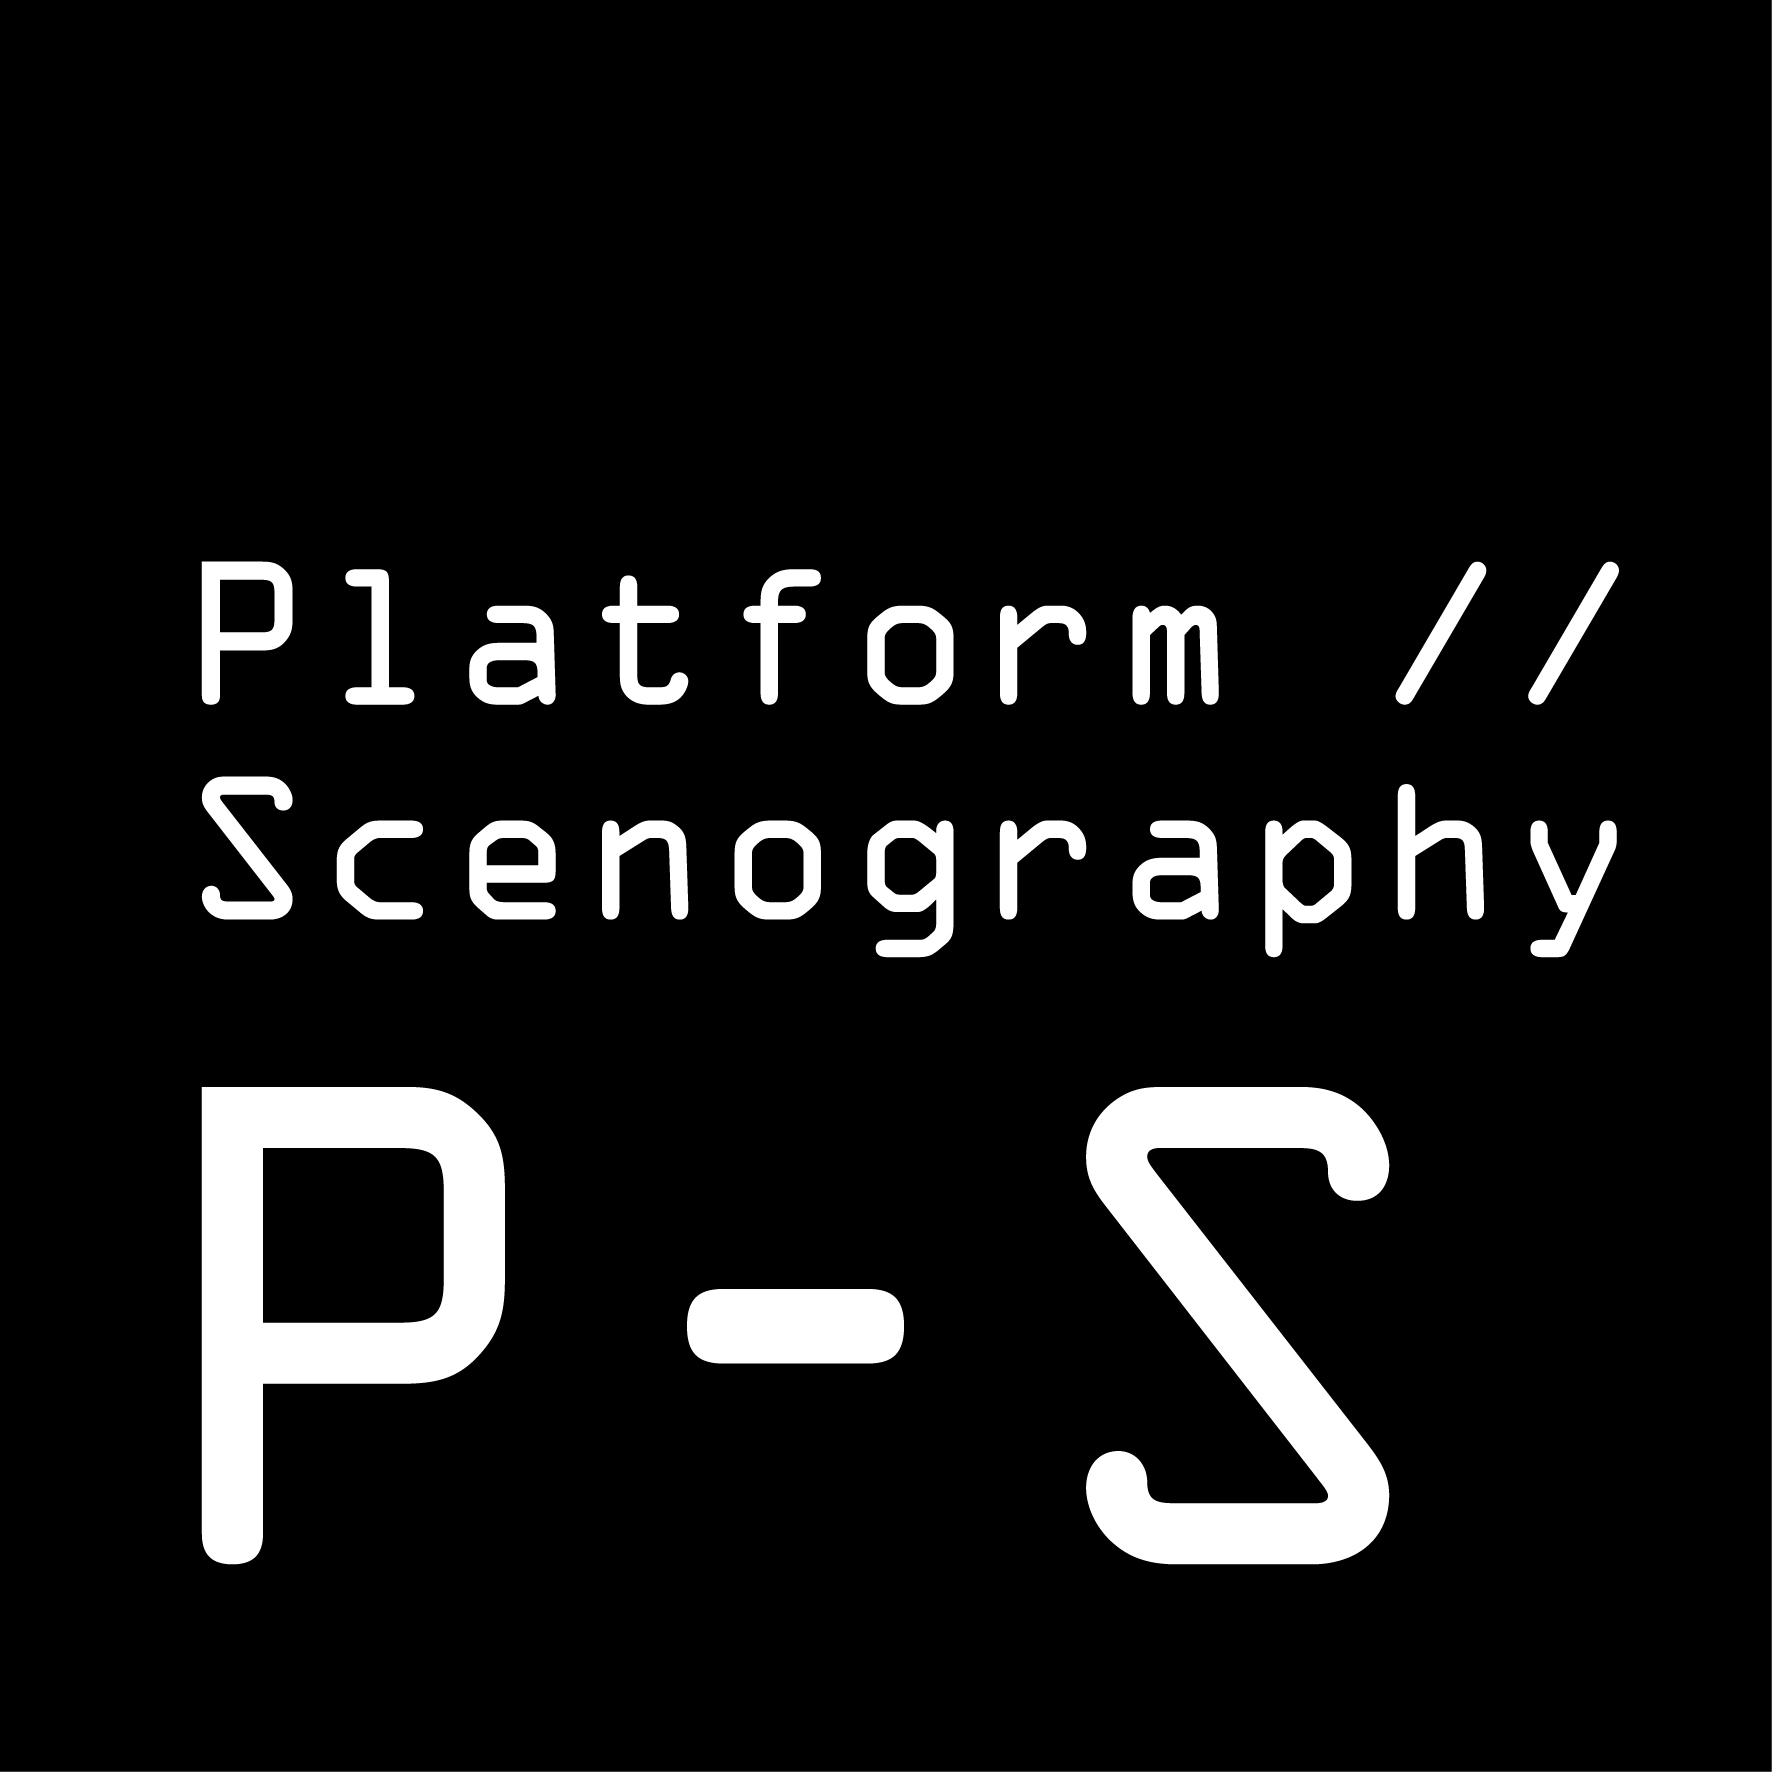 Platform Scenography